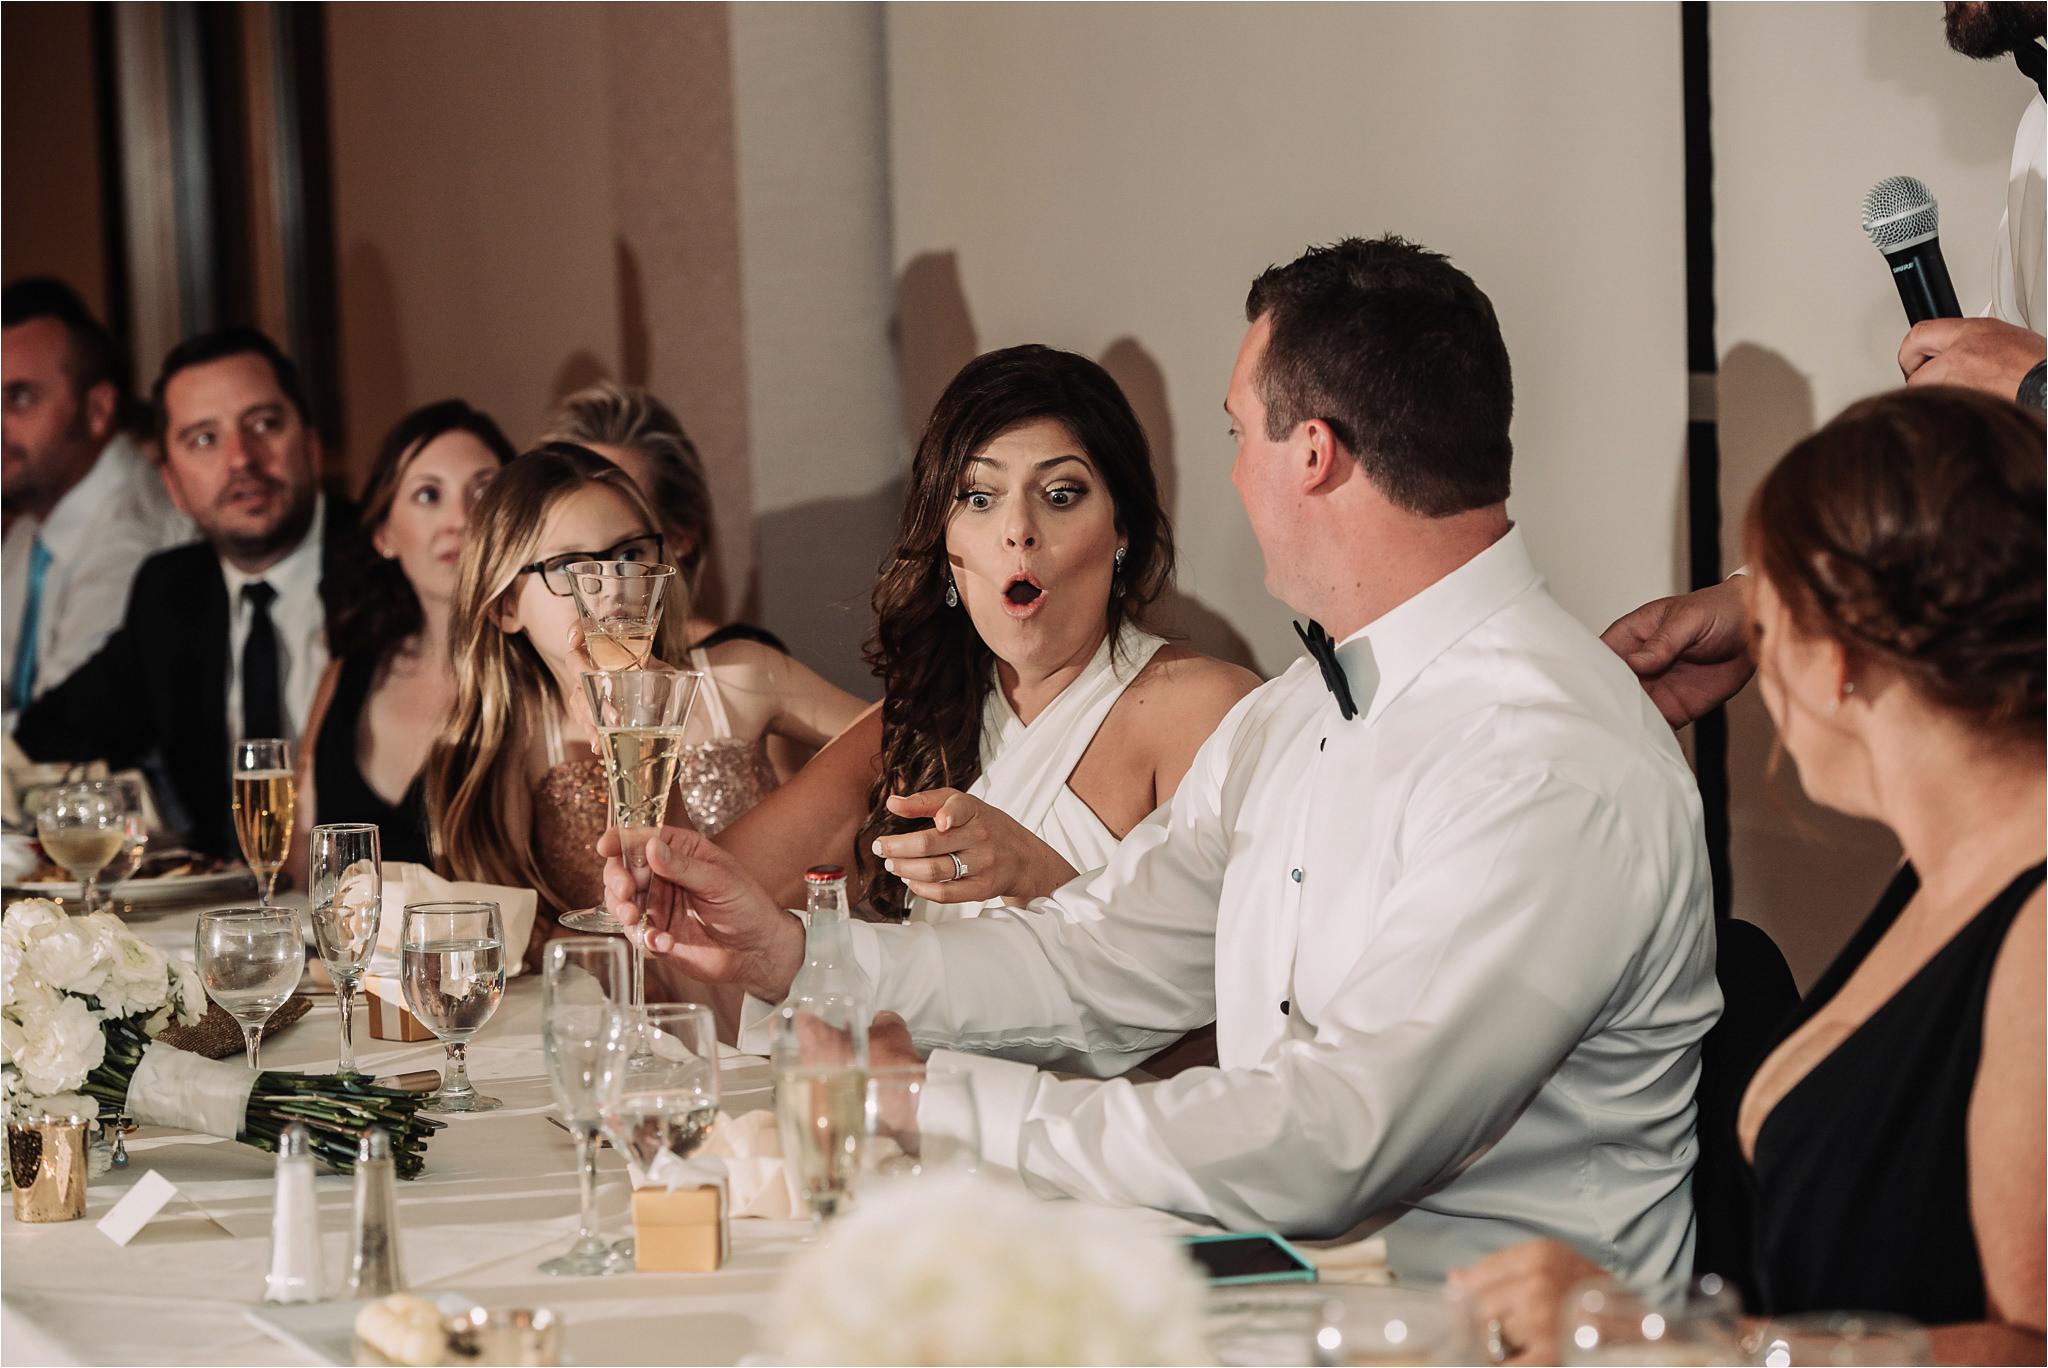 jessica-roman-photography-arden hills wedding photograpger-sacramento-boise-43.jpg